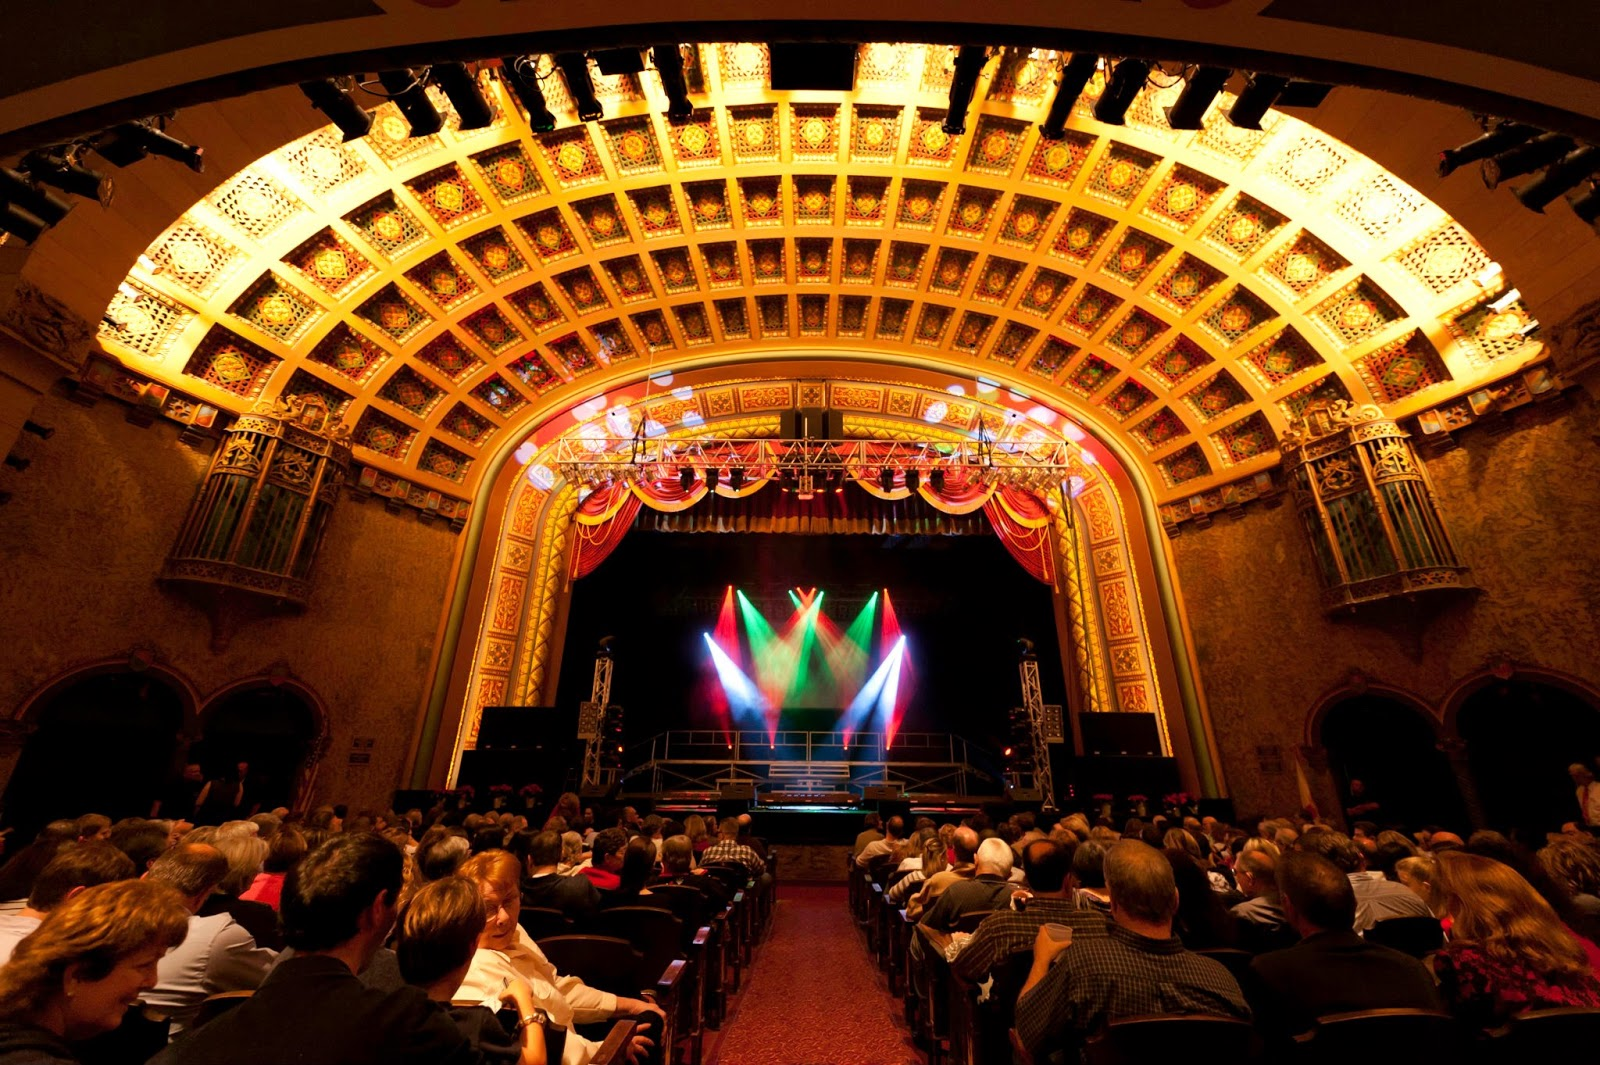 The Florida Theatre